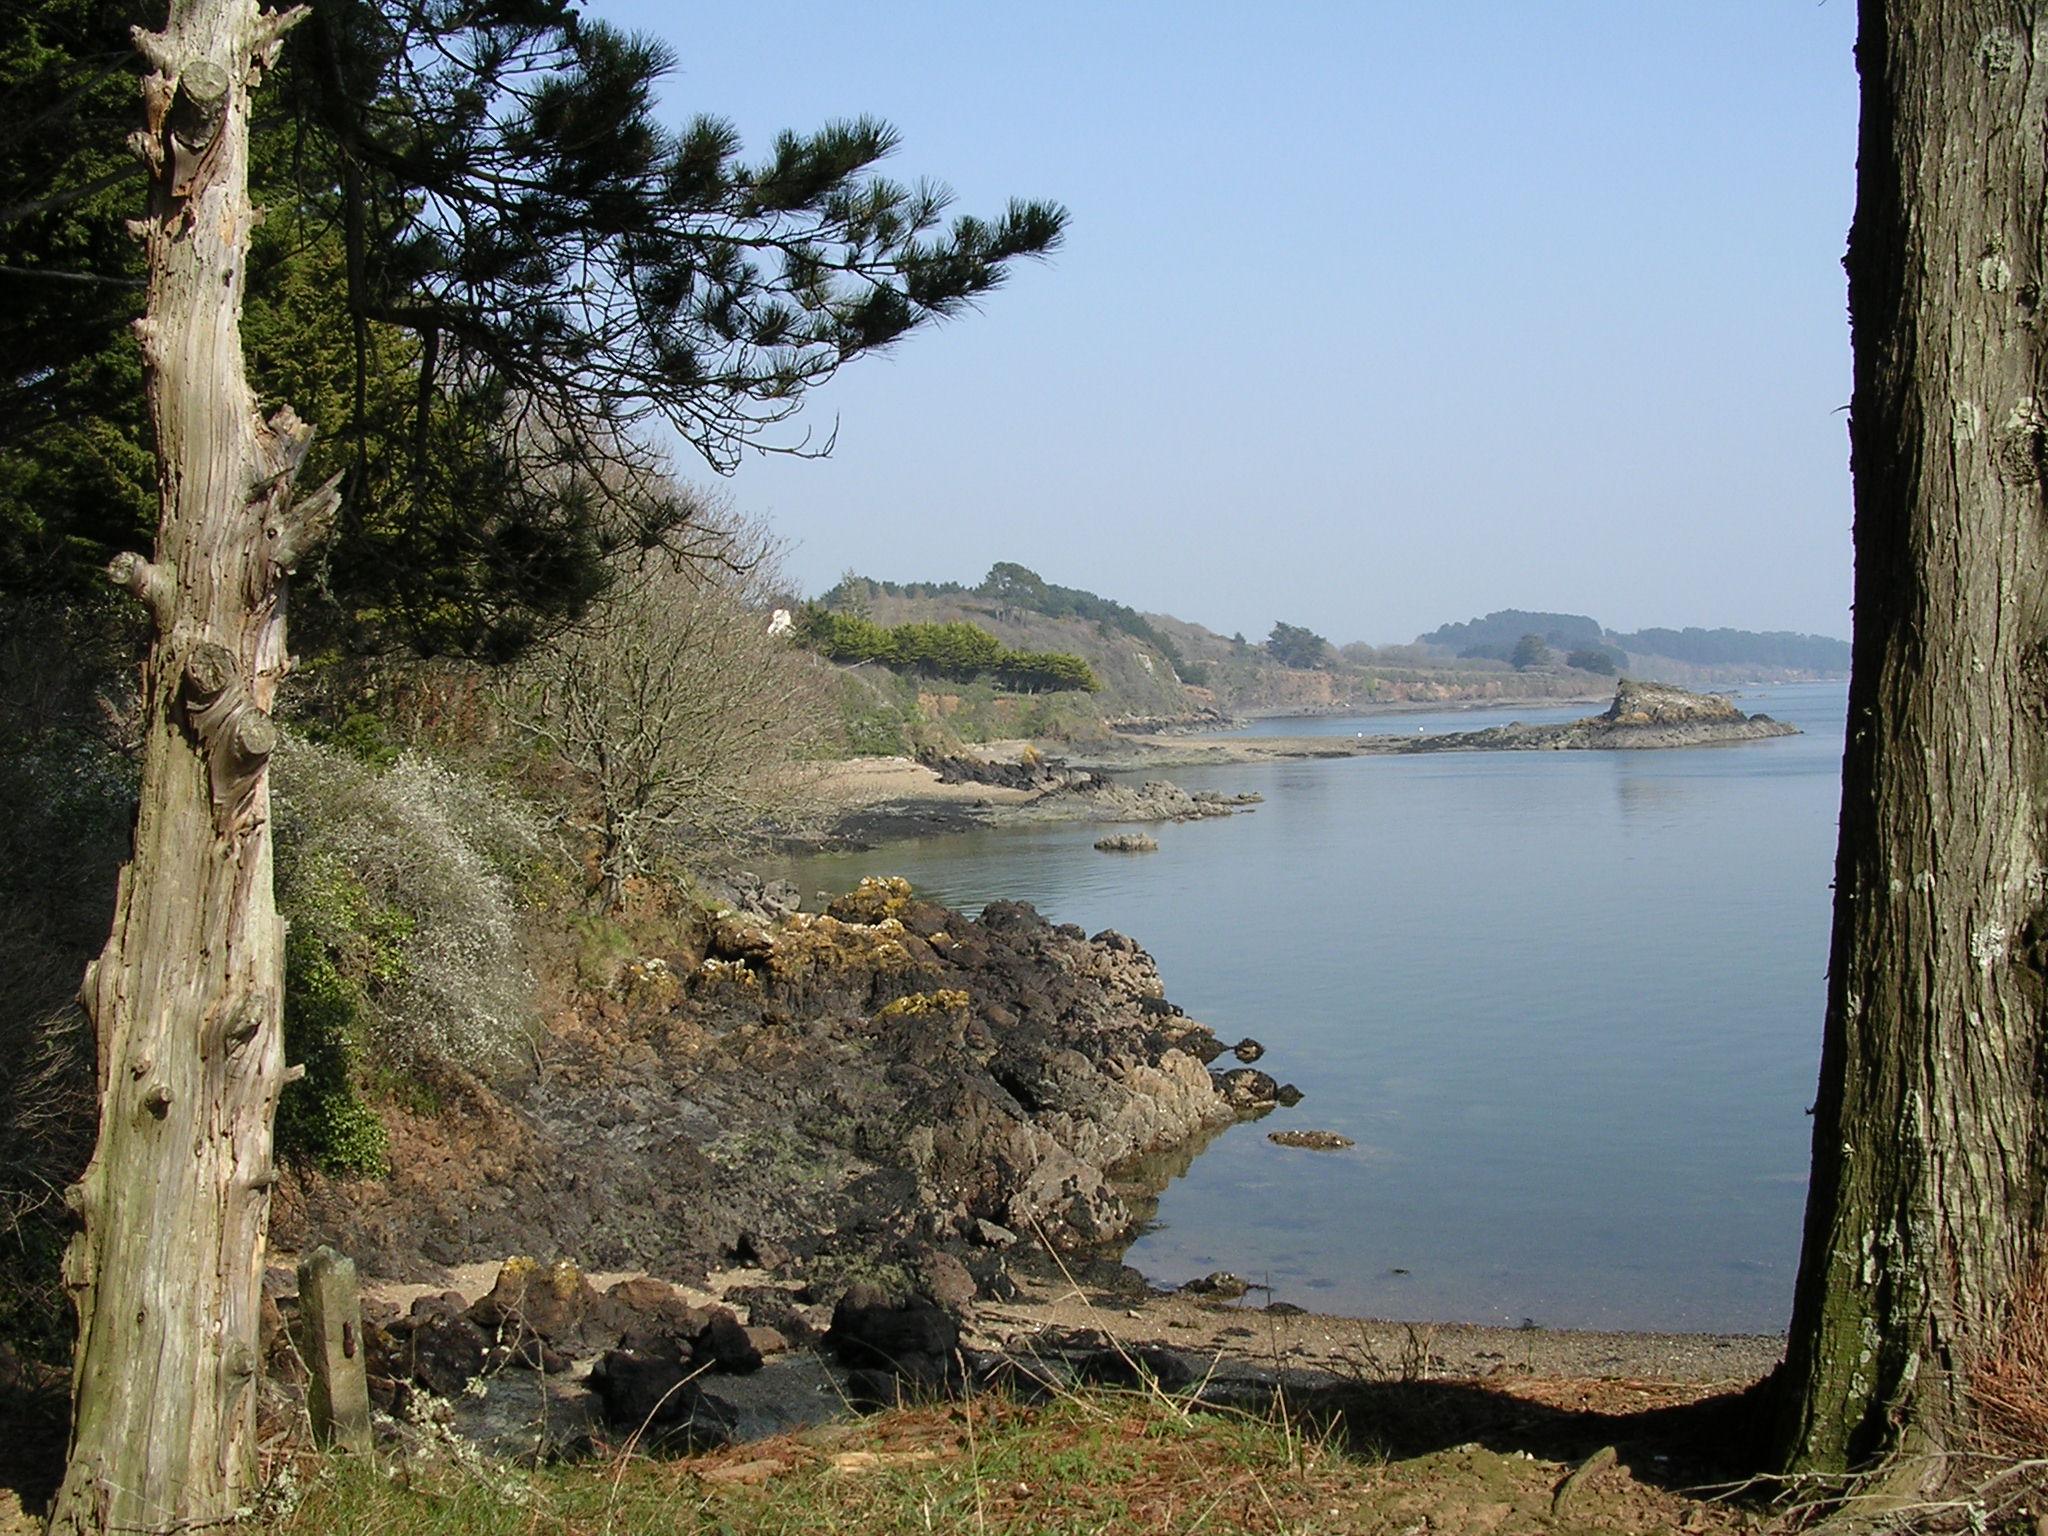 Le sentier côtier de la presqu'ile de Logonna-Daoulas proche de Crozon